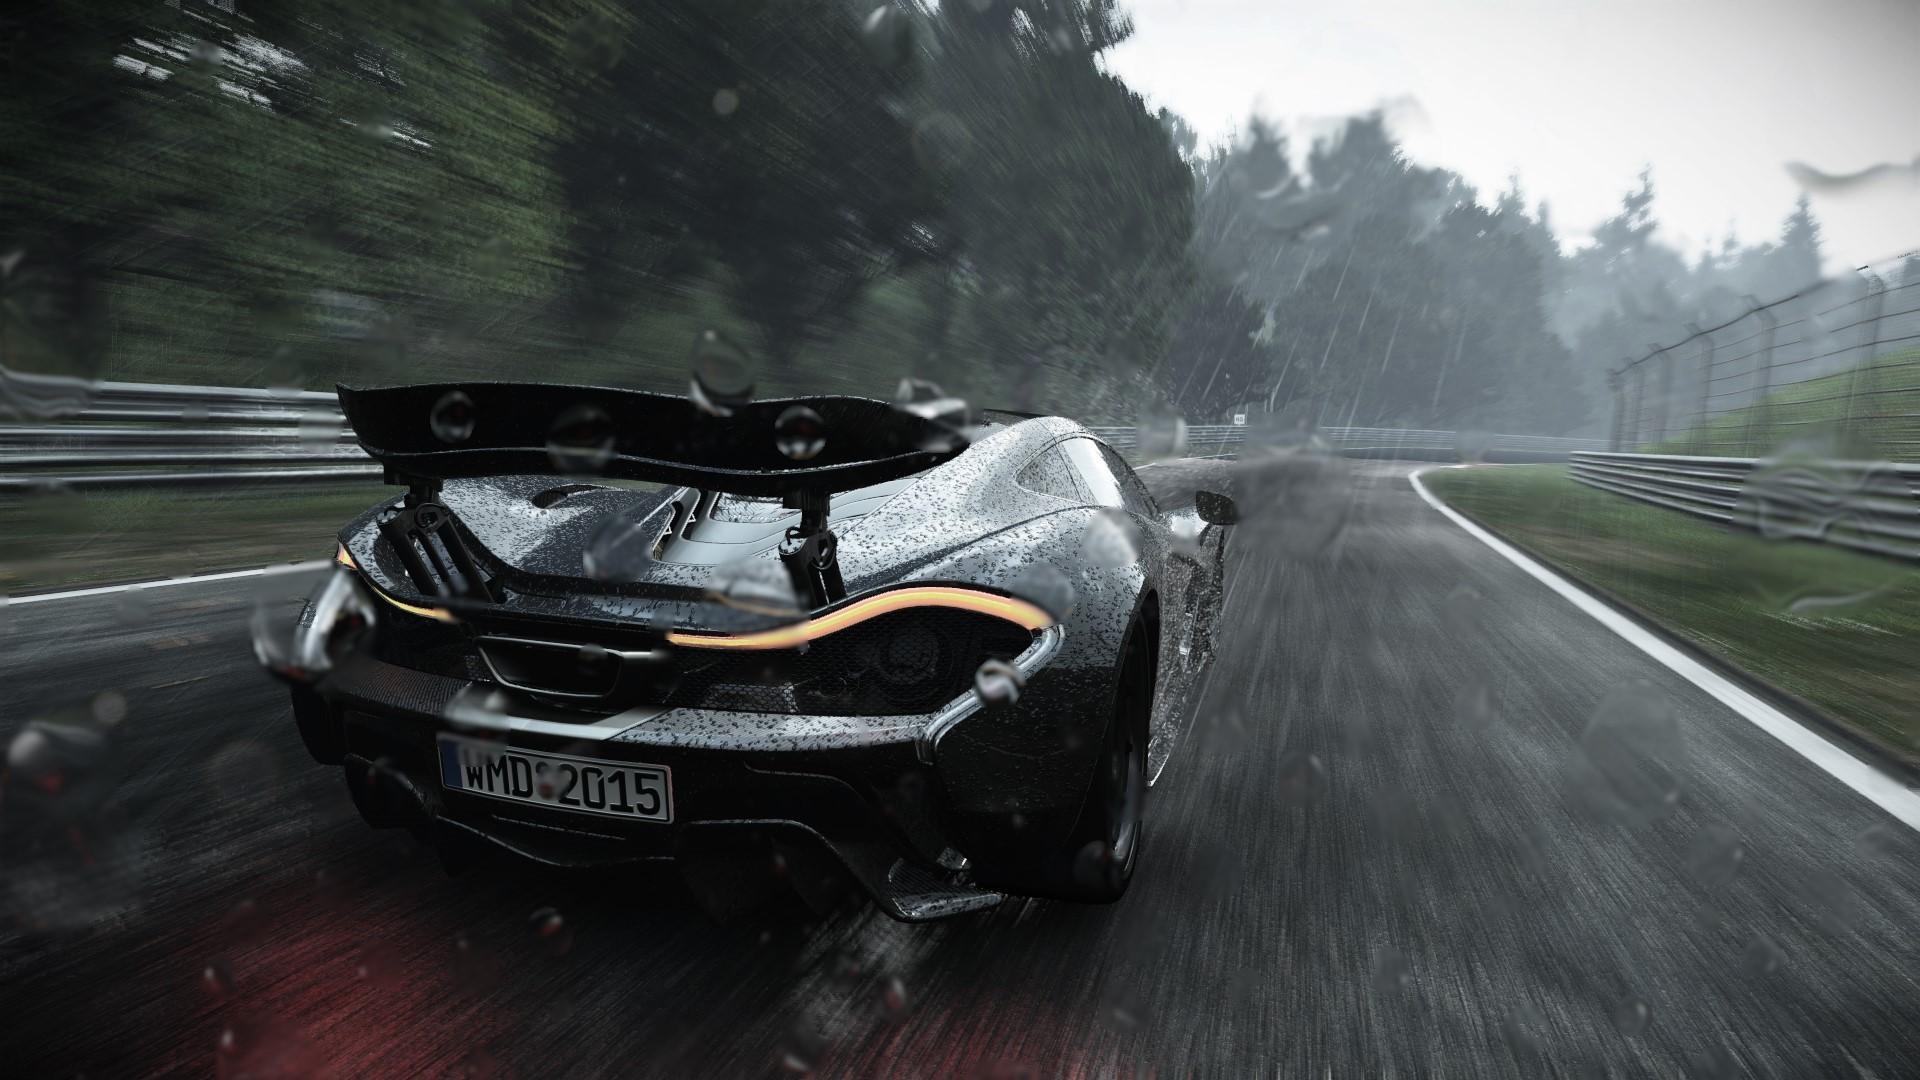 Wallpaper Trees Digital Art Video Games Race Cars Rain